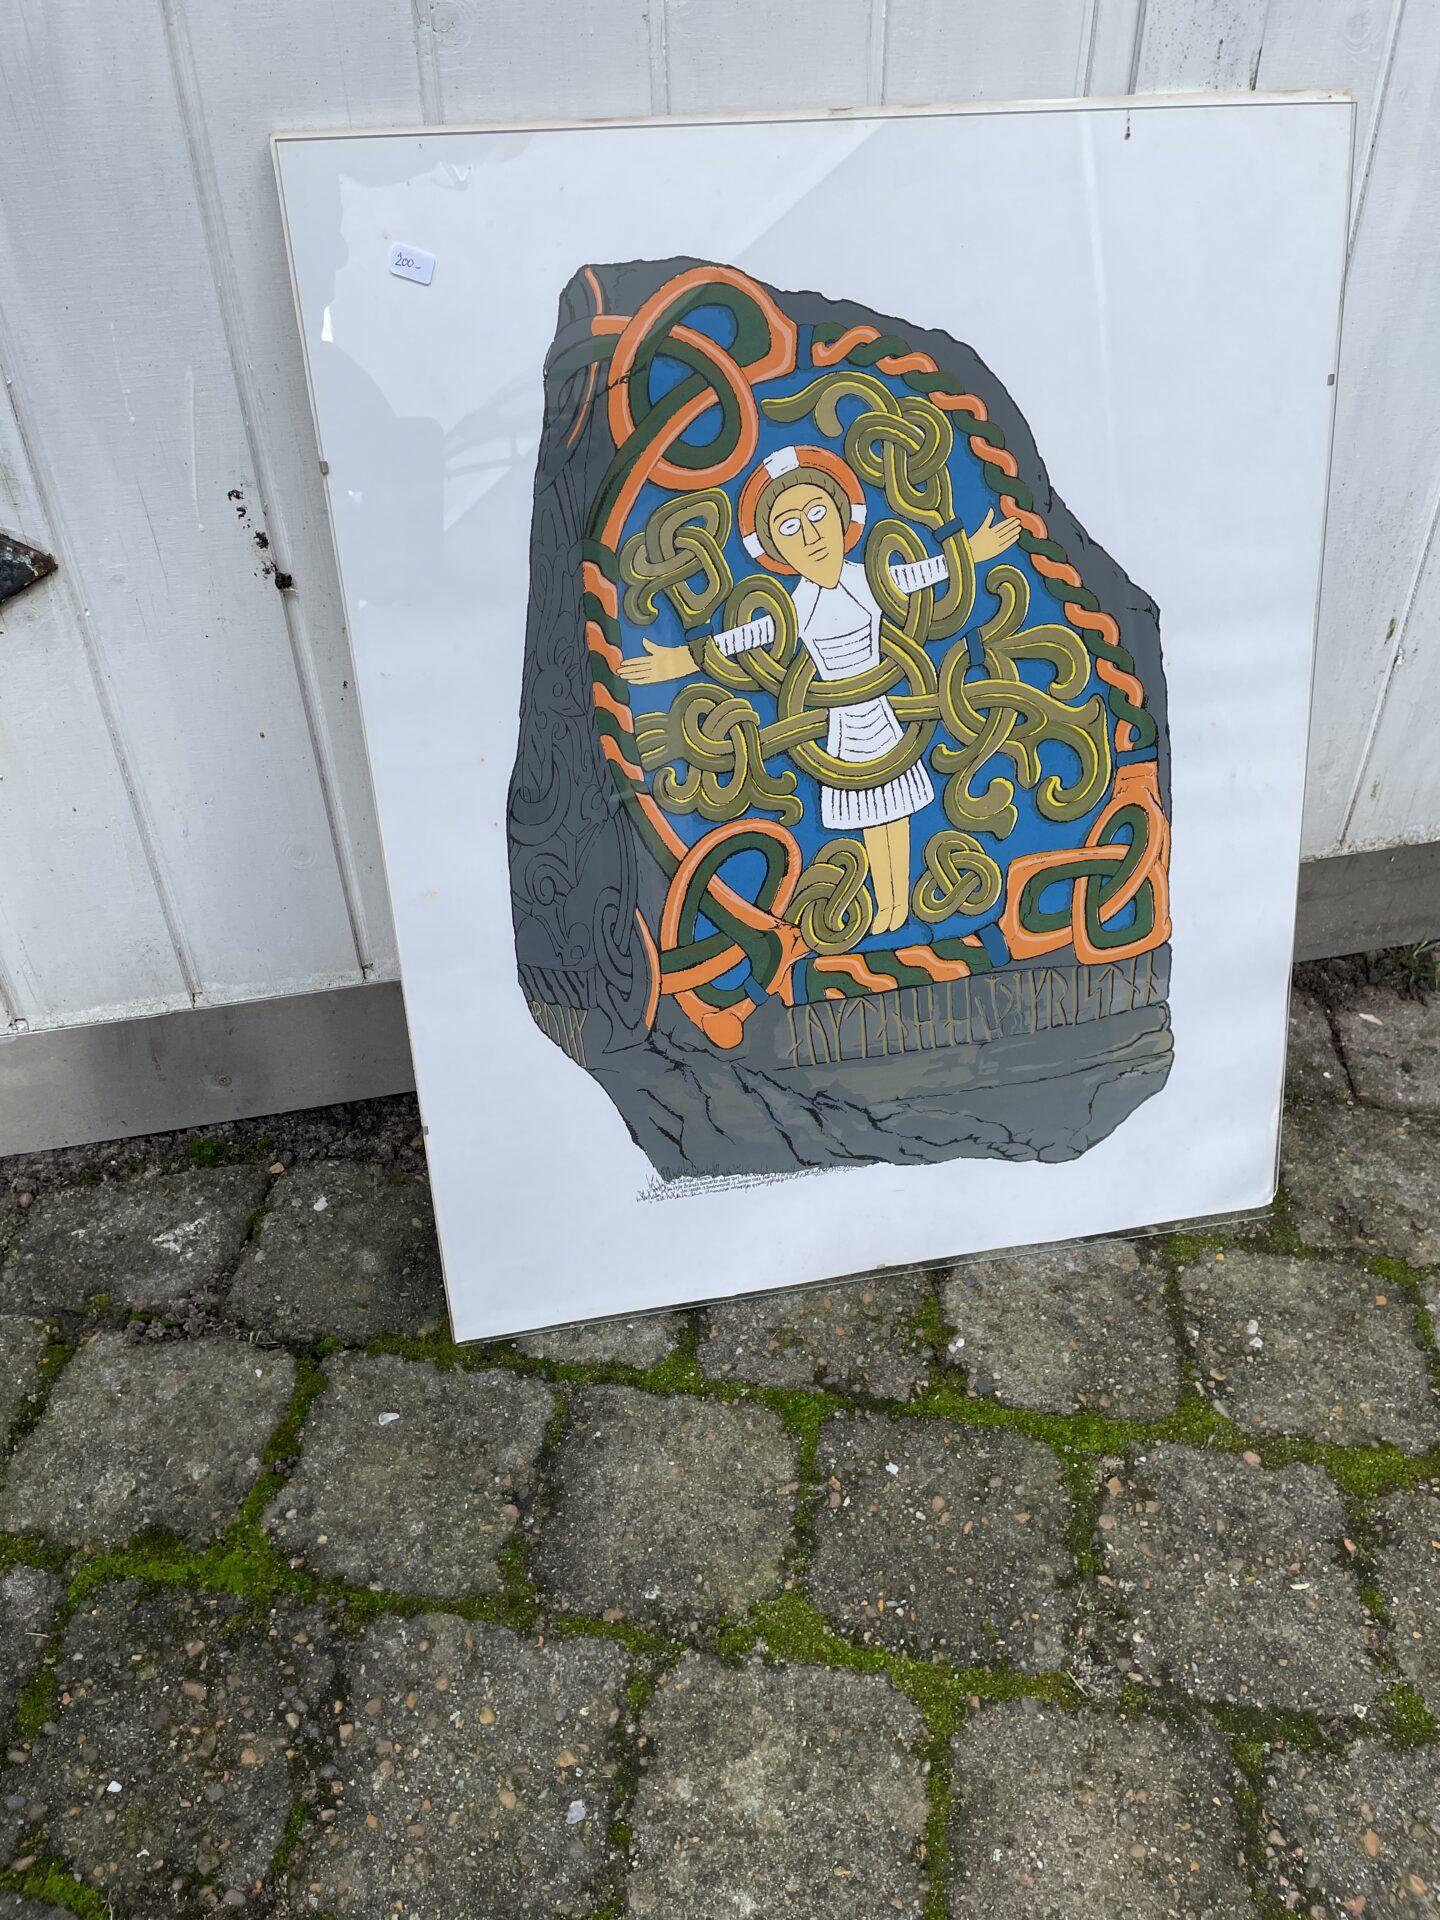 Jelling-stenen, litografisk tryk,50x60 cm, pris 200kr